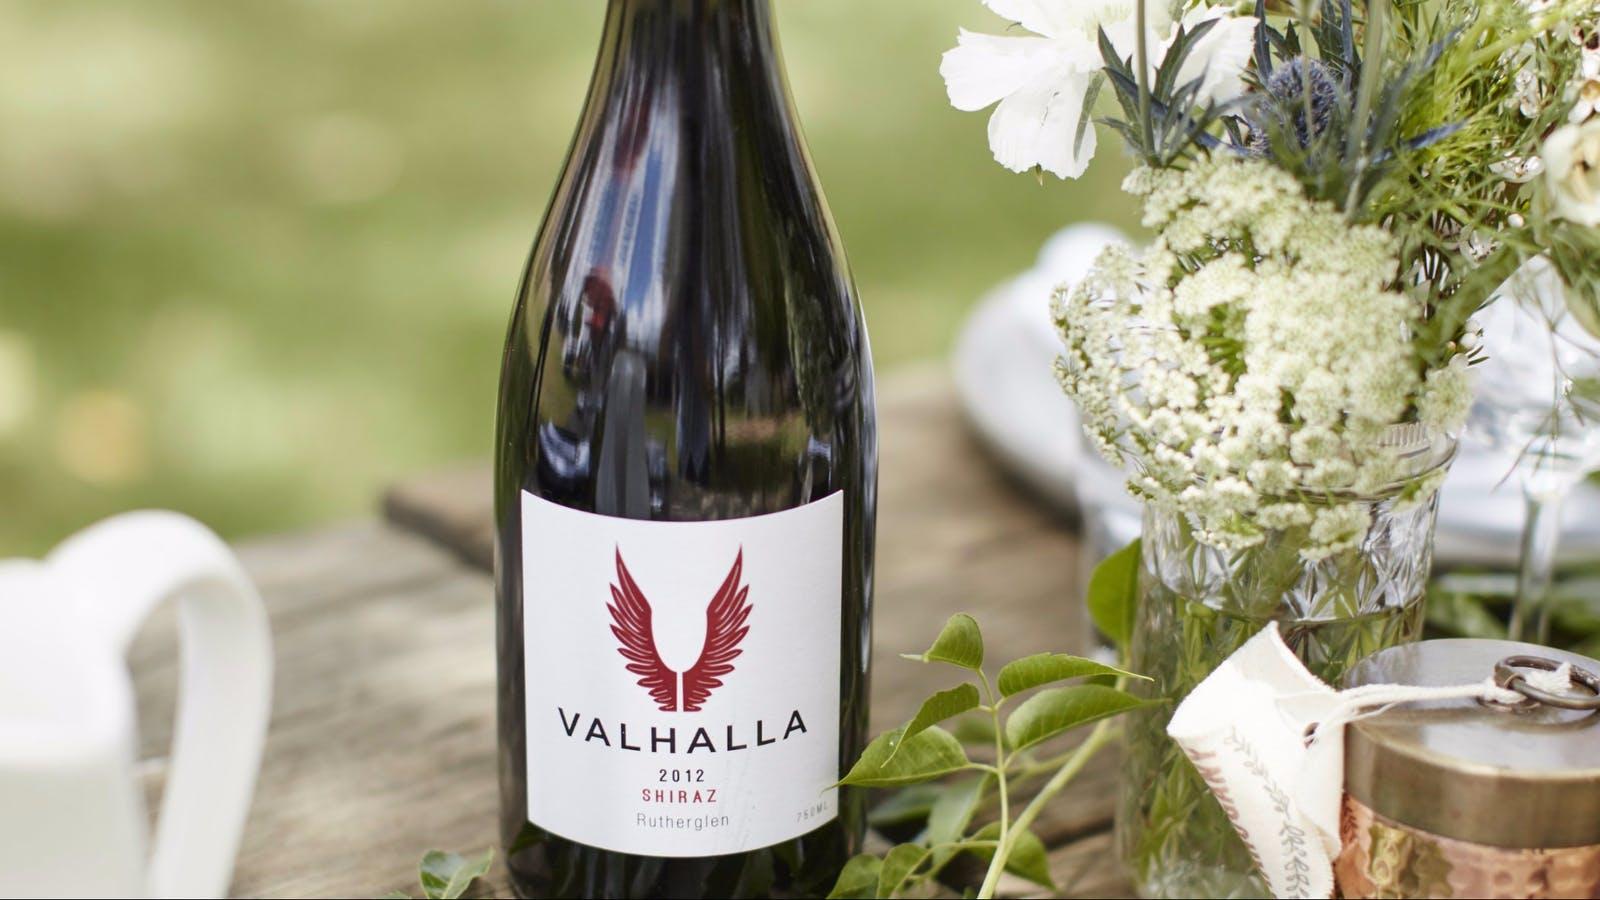 Valhalla Shiraz Bottle